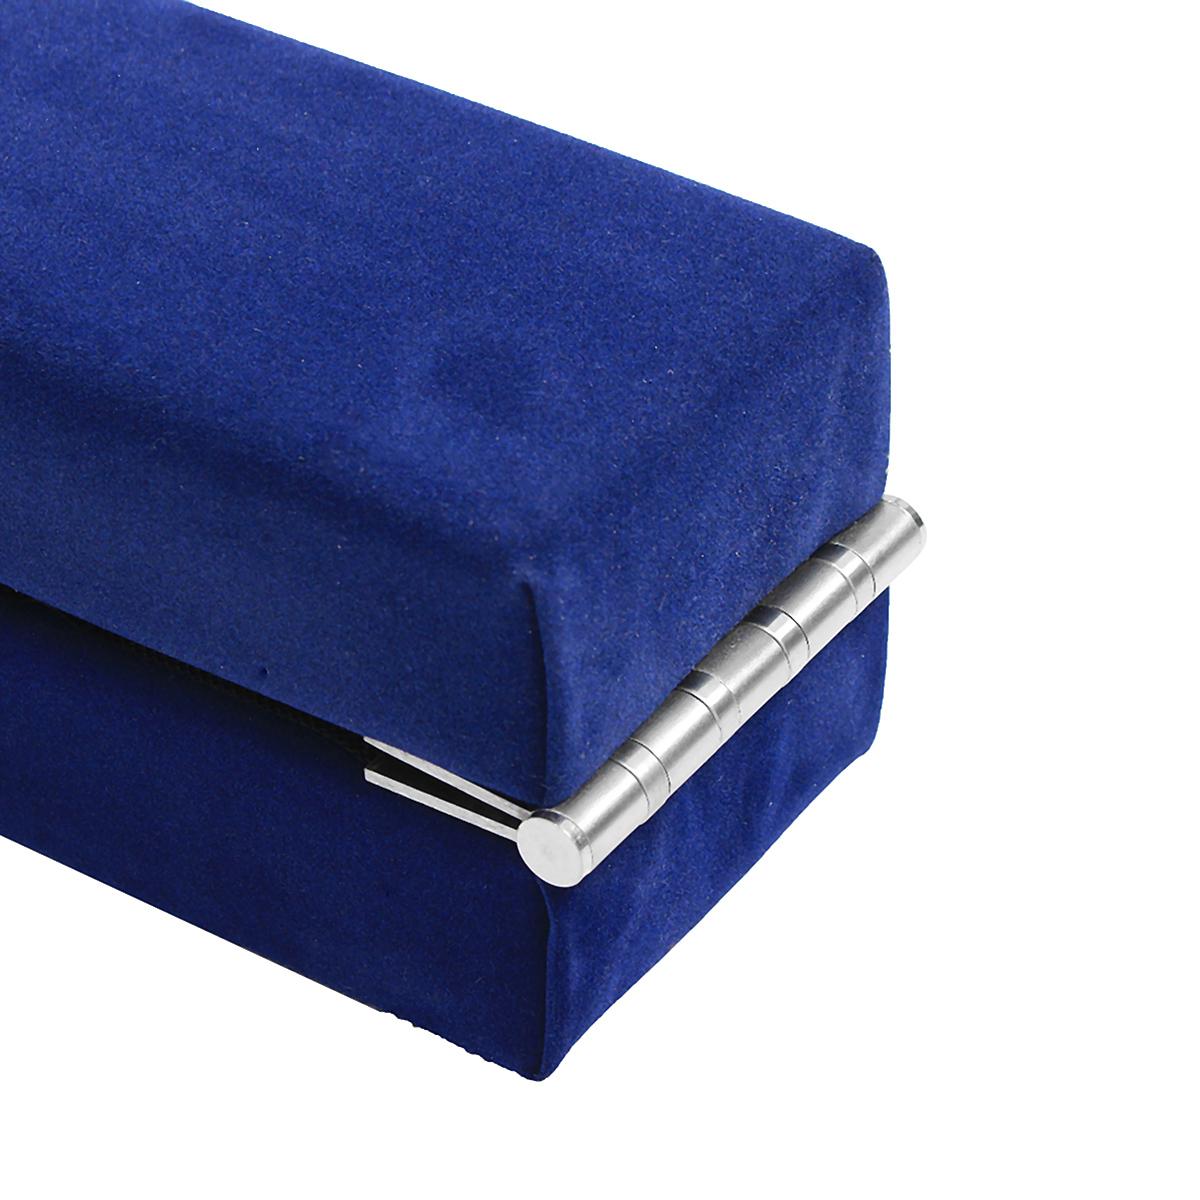 16696374ec46 48x3.9x2.2inch Kids Folding Balance Beam Gymnastics Mat Training Pad Sports  Protective Gear